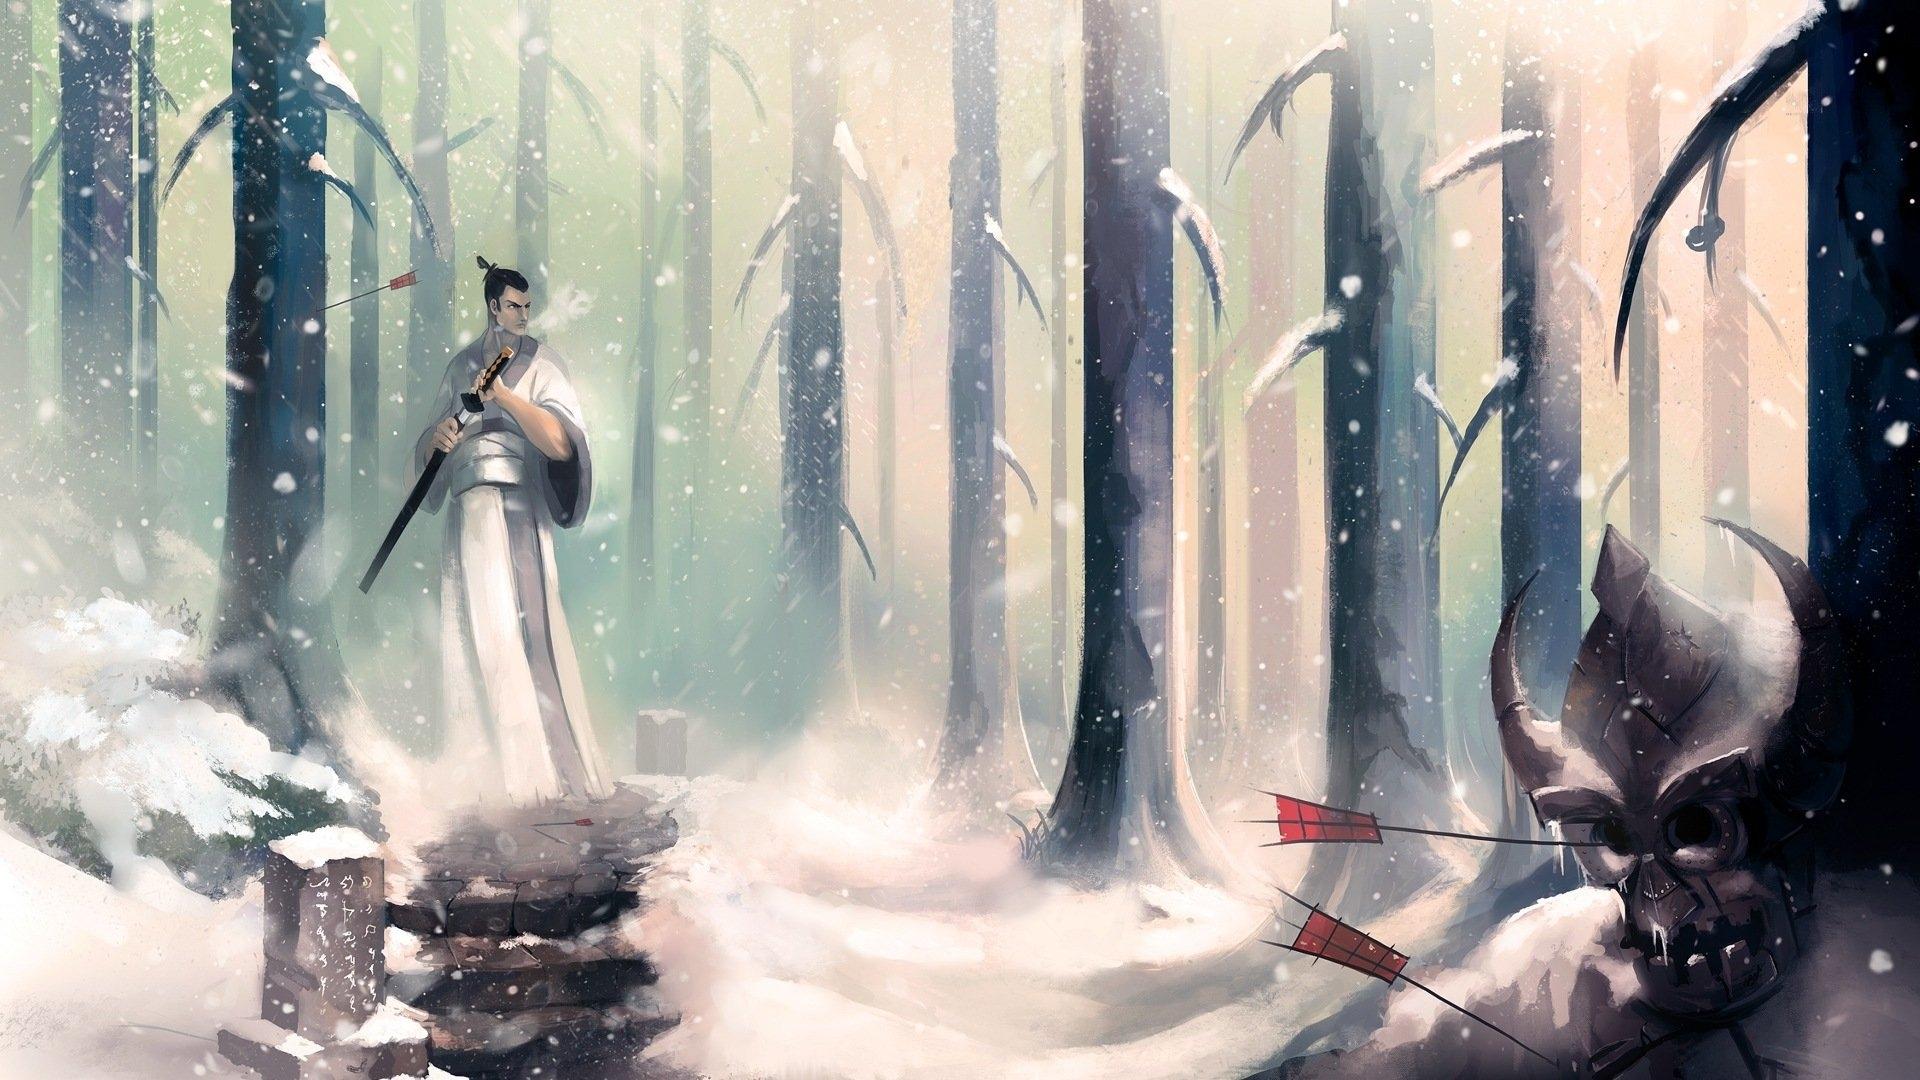 samurai jack full hd wallpaper and background image | 1920x1080 | id